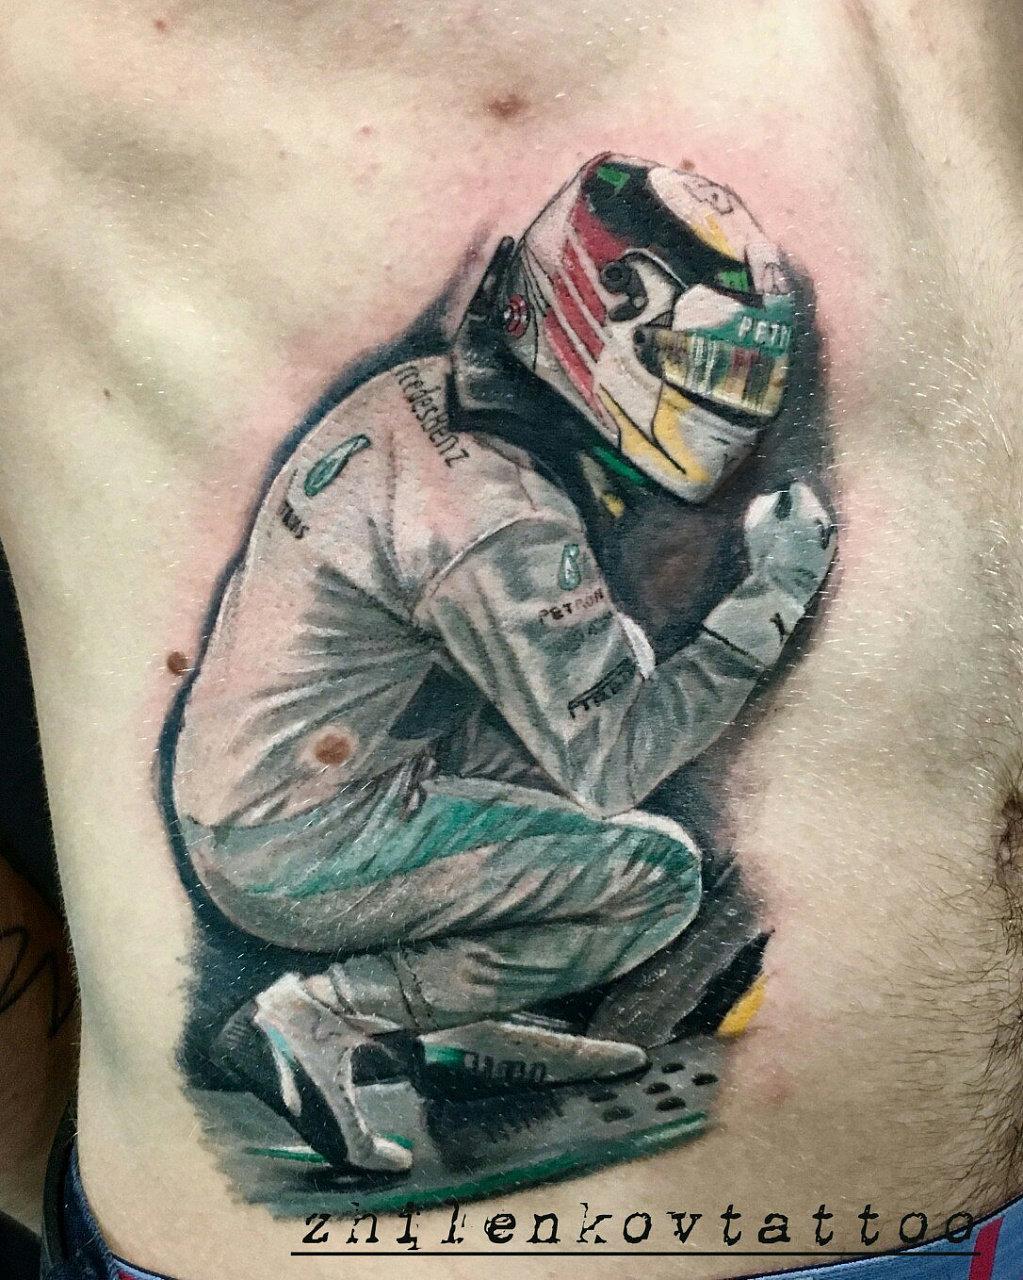 карьера фото тату для гонщика стиле сафари